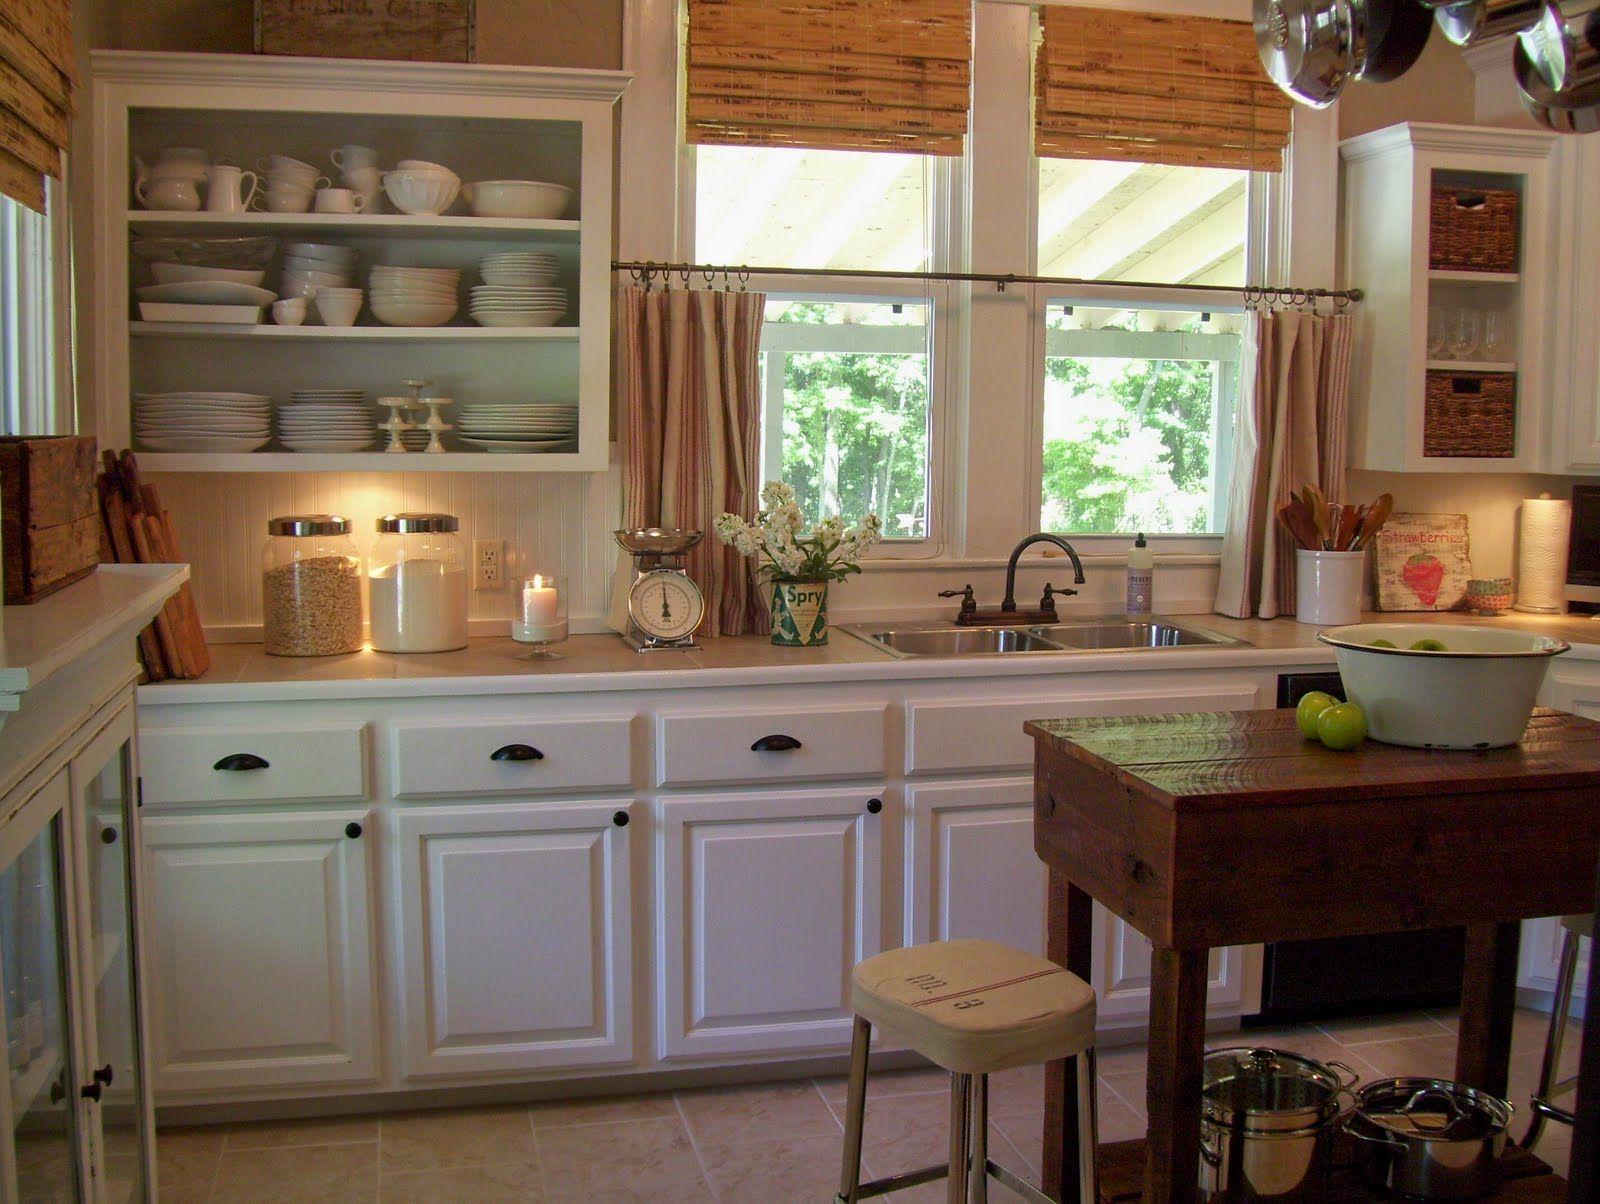 Rustic Kitchen Decorating Ideas Decorative Tile Backsplash Pin By Philanthropyalamode On Pinterest